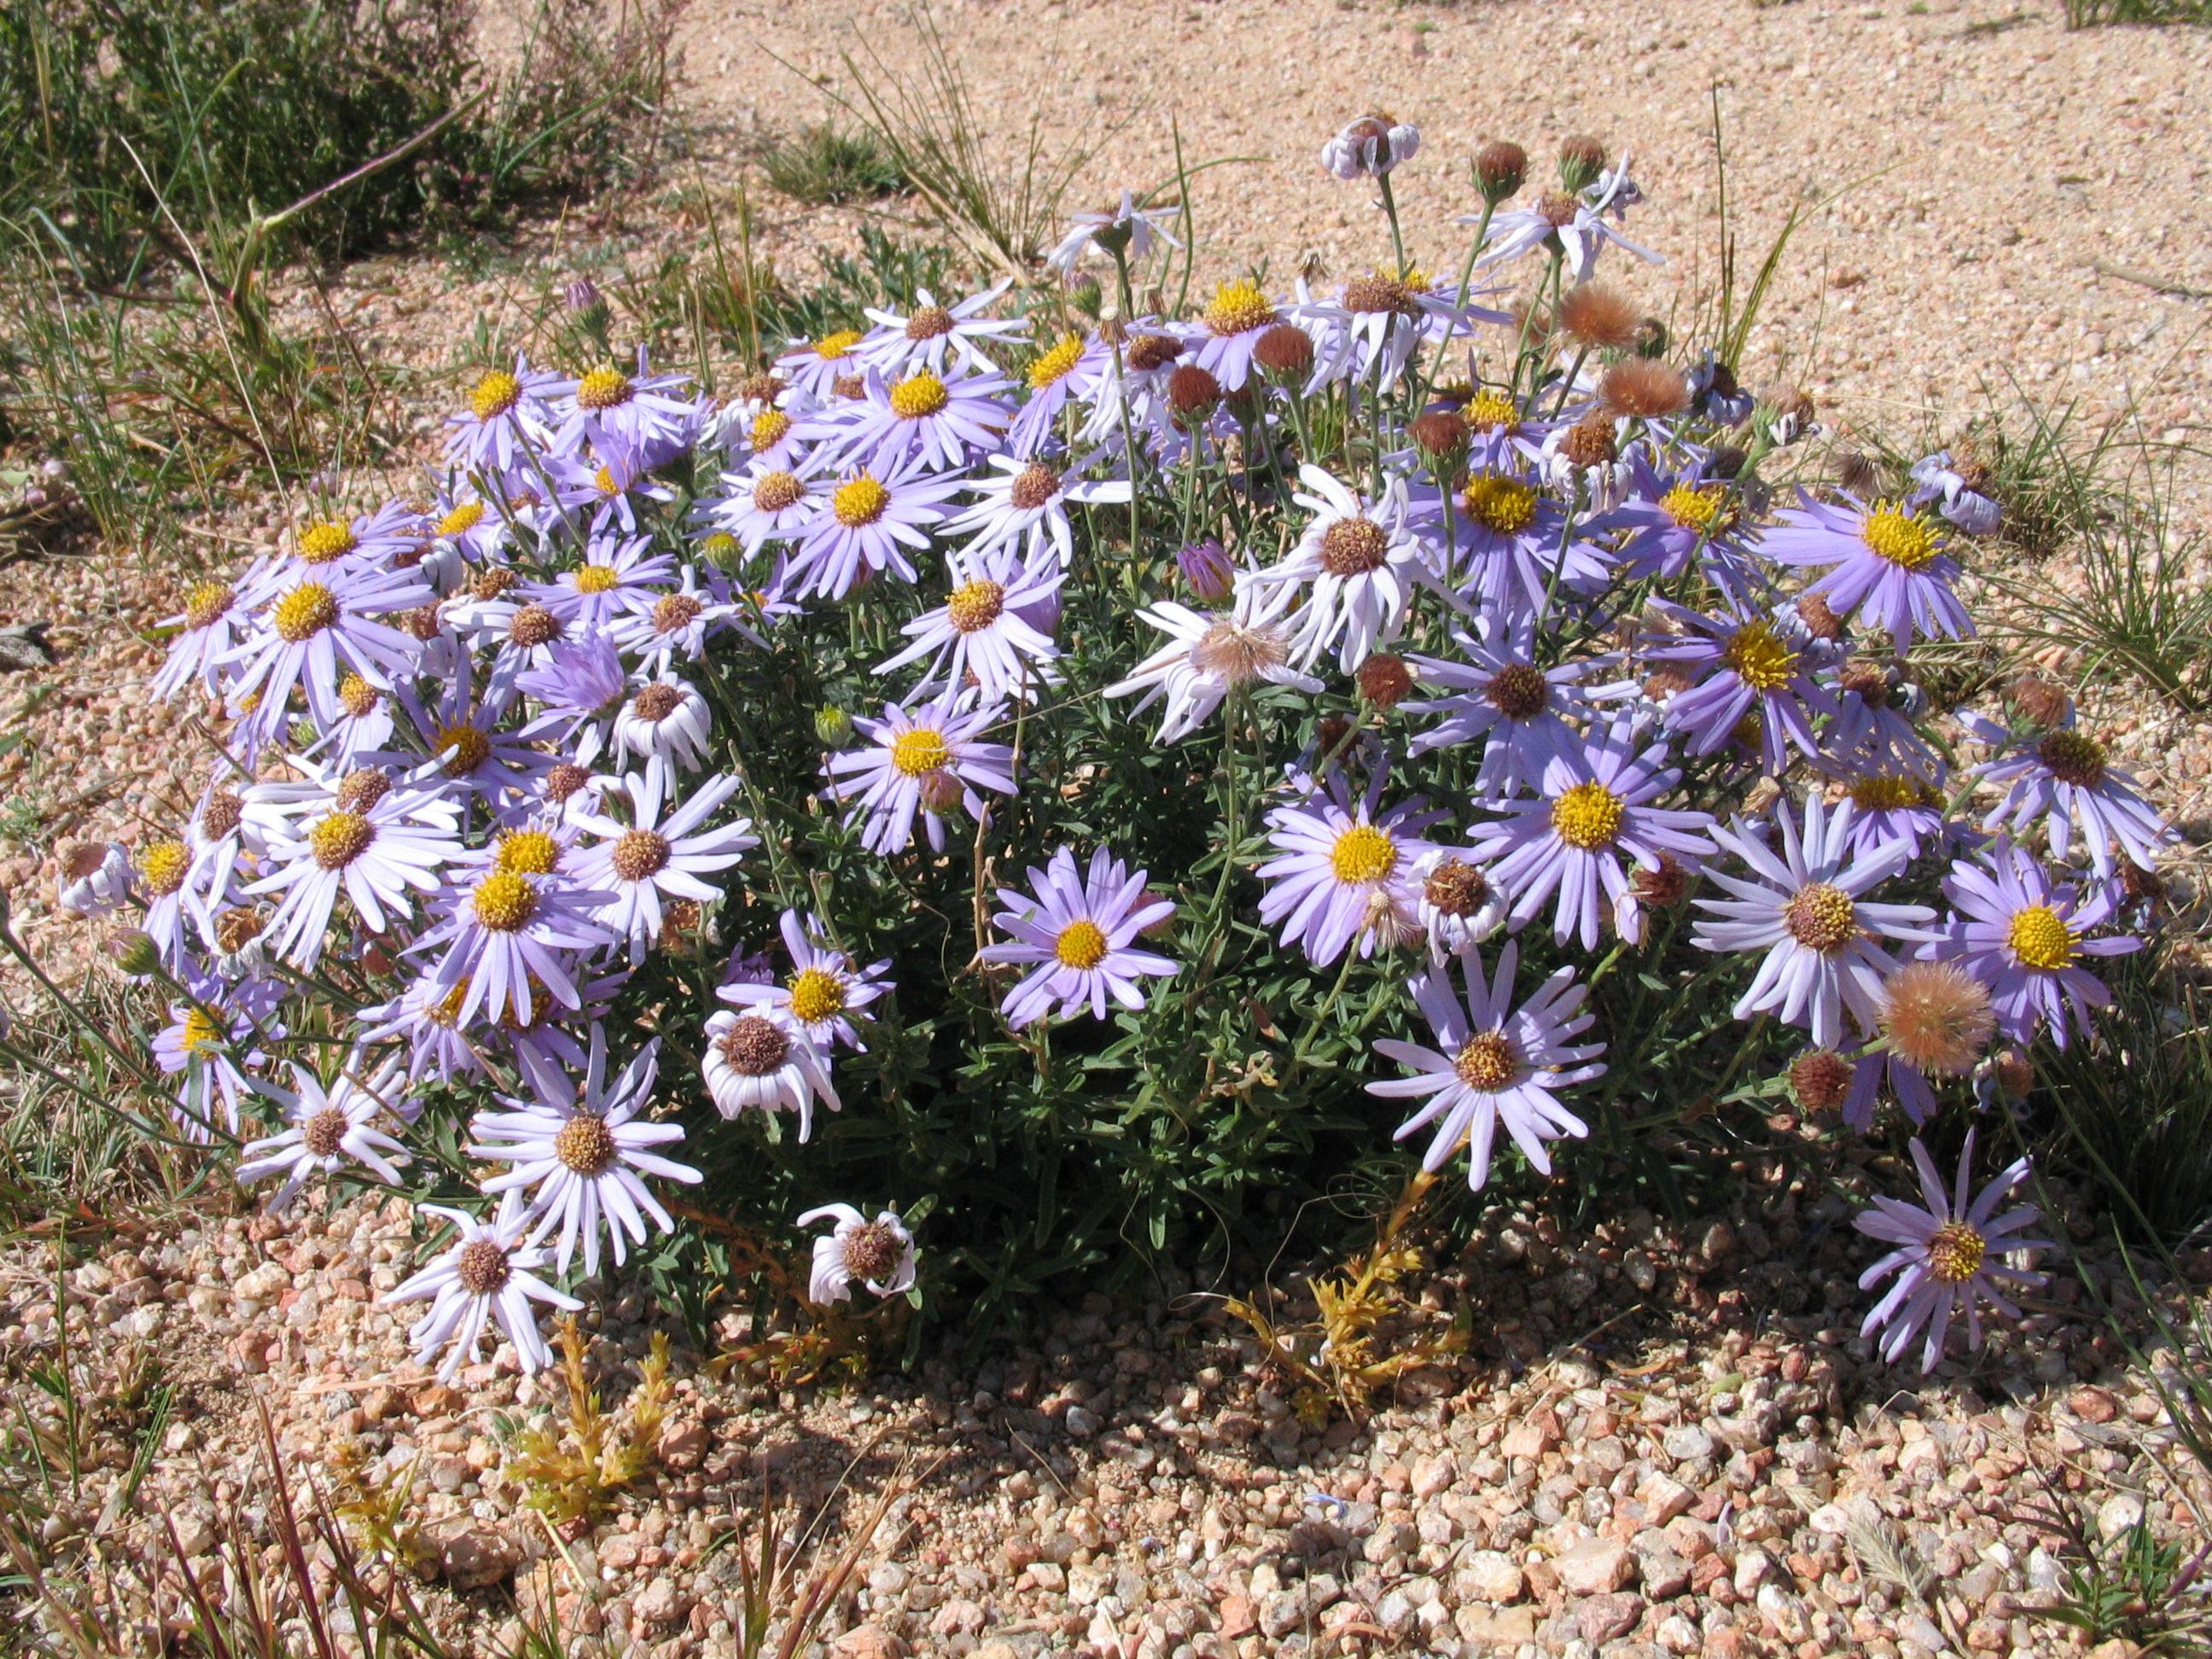 view image: Heteropappus altaicus (Willd.) Novopokr.